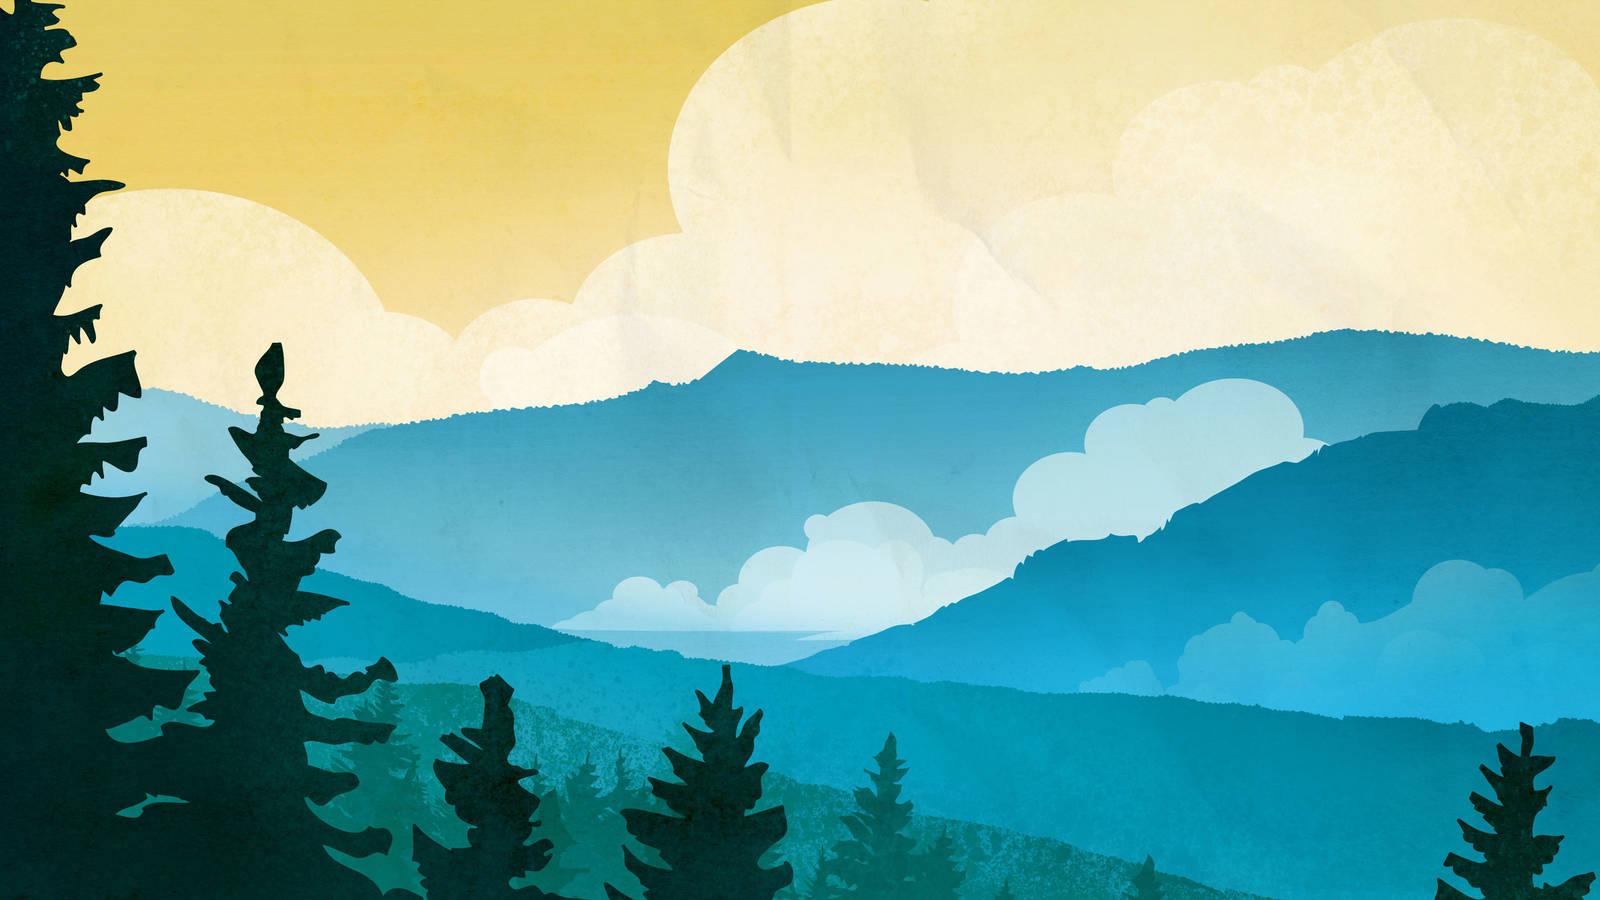 See National Parks Through Artists Eyes National Parks Conservation Association